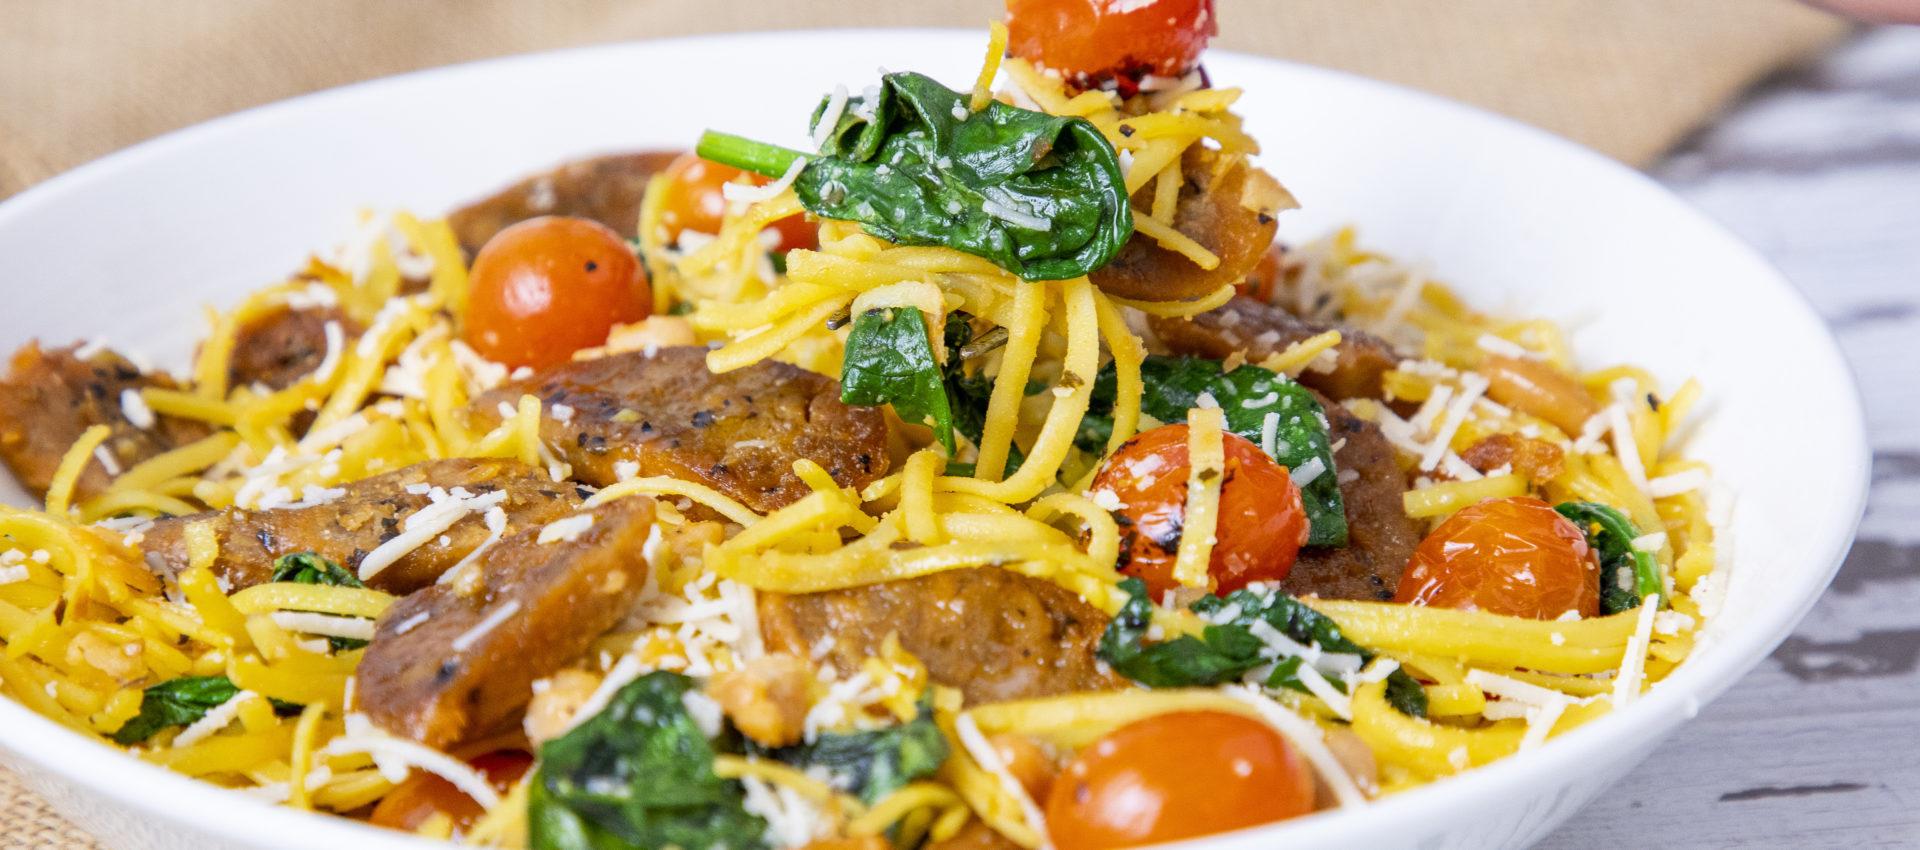 Salchicha beyond meat con pasta receta